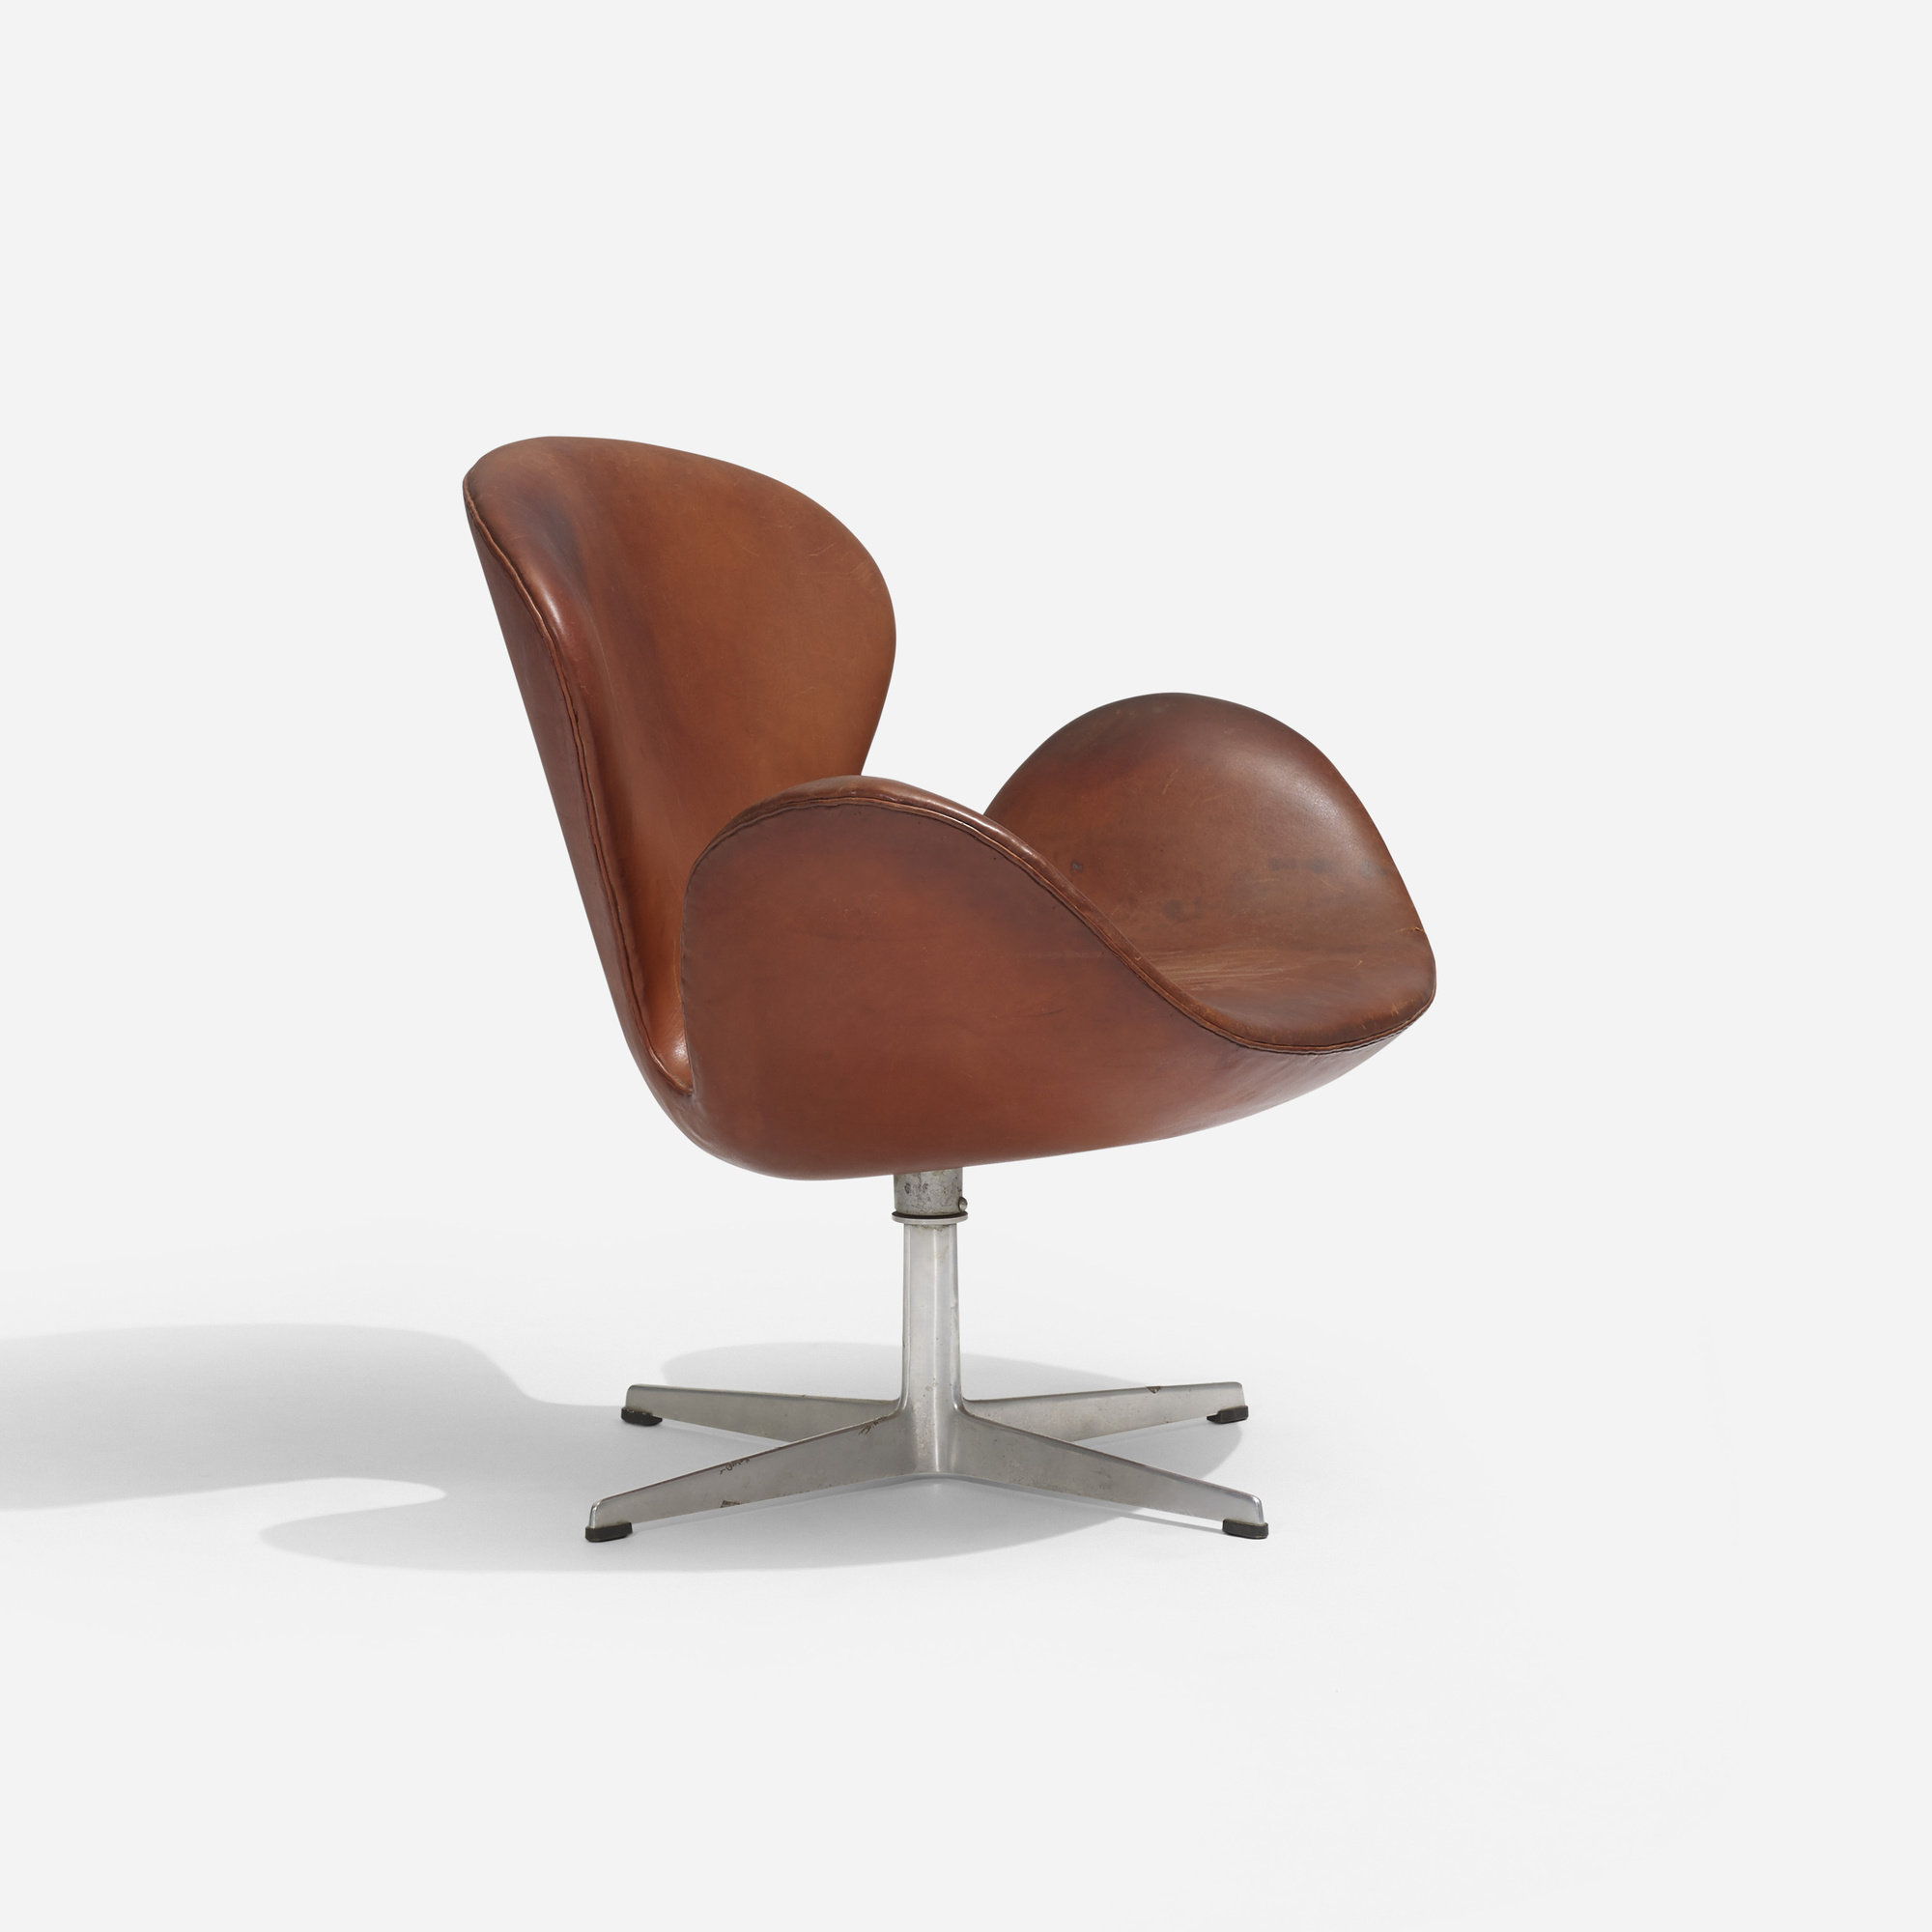 103: Arne Jacobsen / Swan chair (1 of 3)